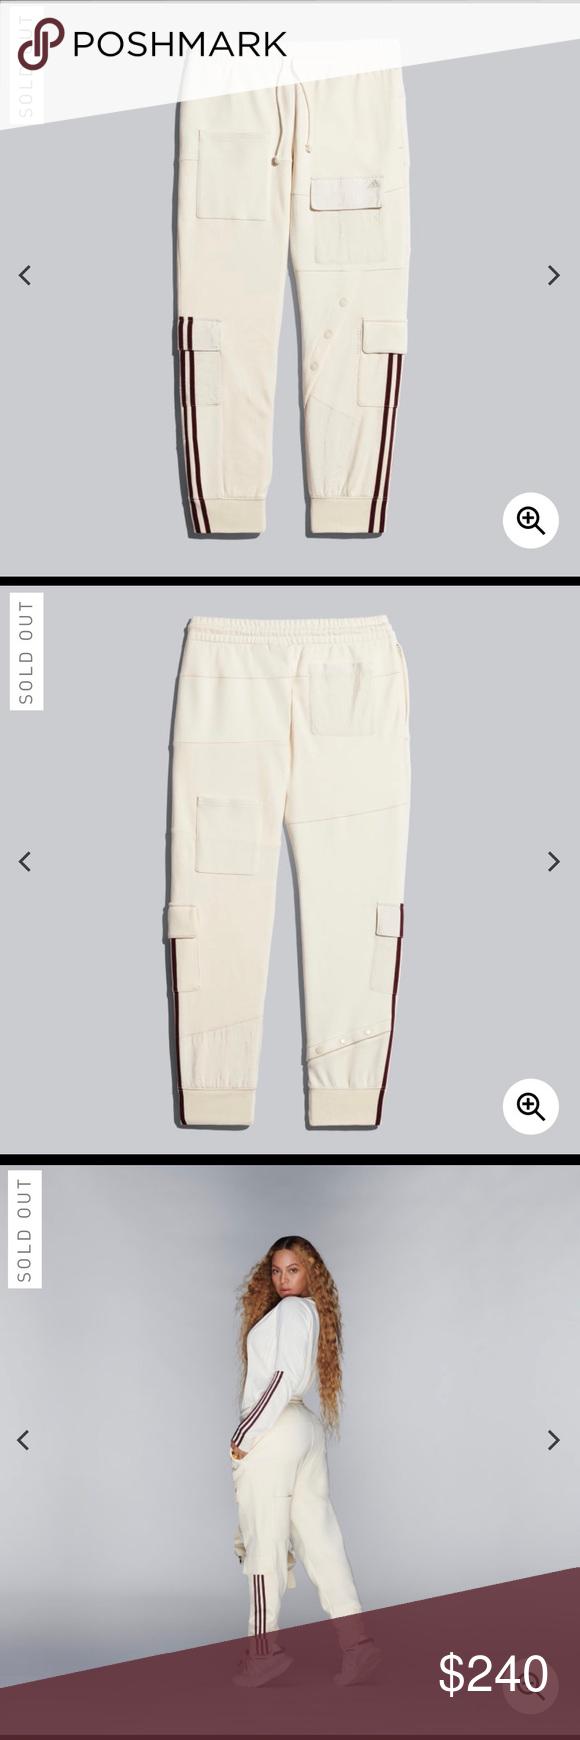 Ivy Park Adidas Sweatpants Cargo Adidas Sweatpants Sweatpants Pants For Women